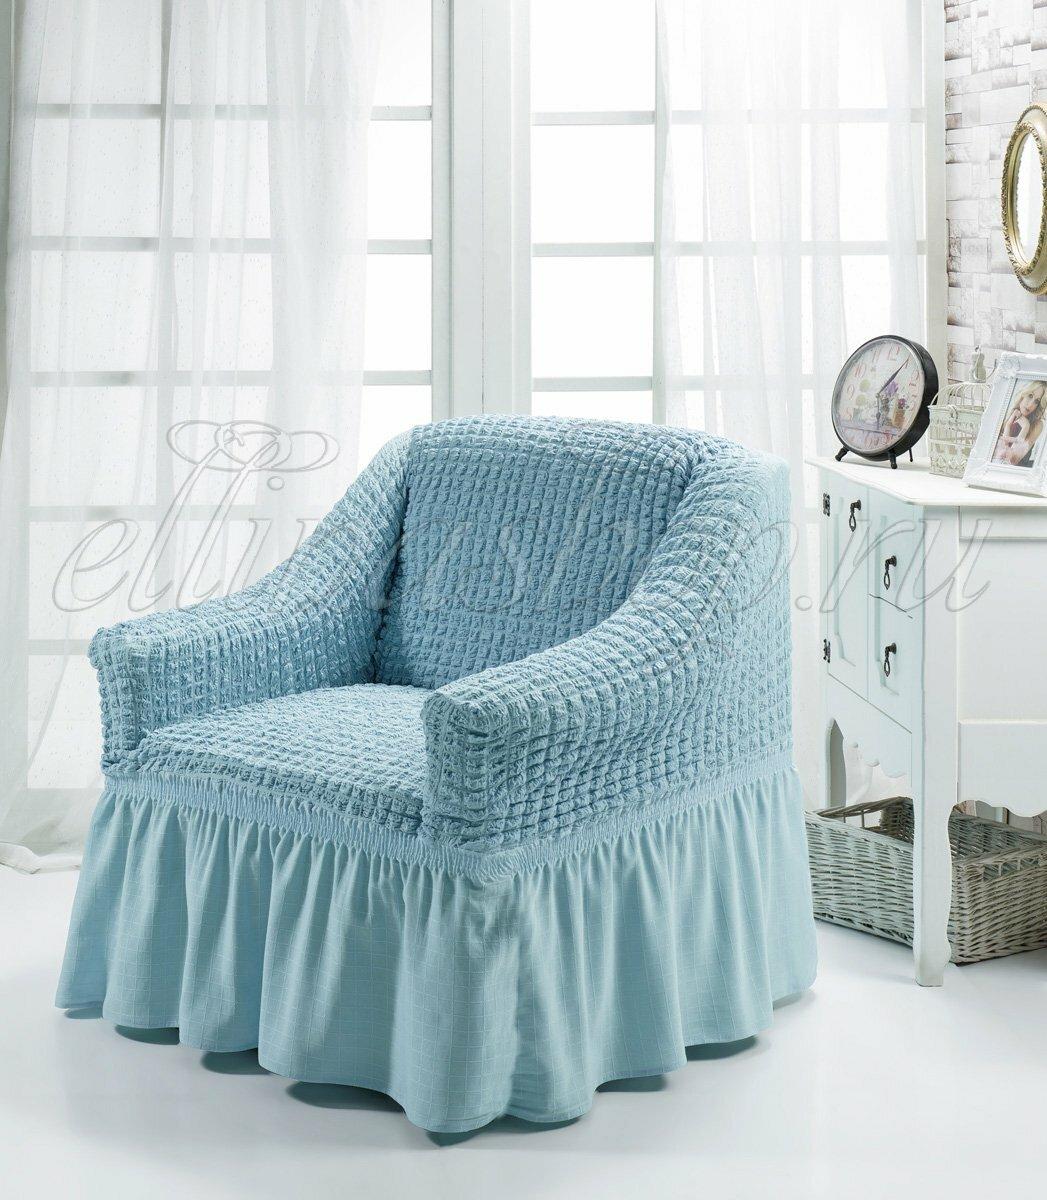 1797 Bulsan бирюзовый чехол для кресла Karna (бирюзовый), Чехол для кресла